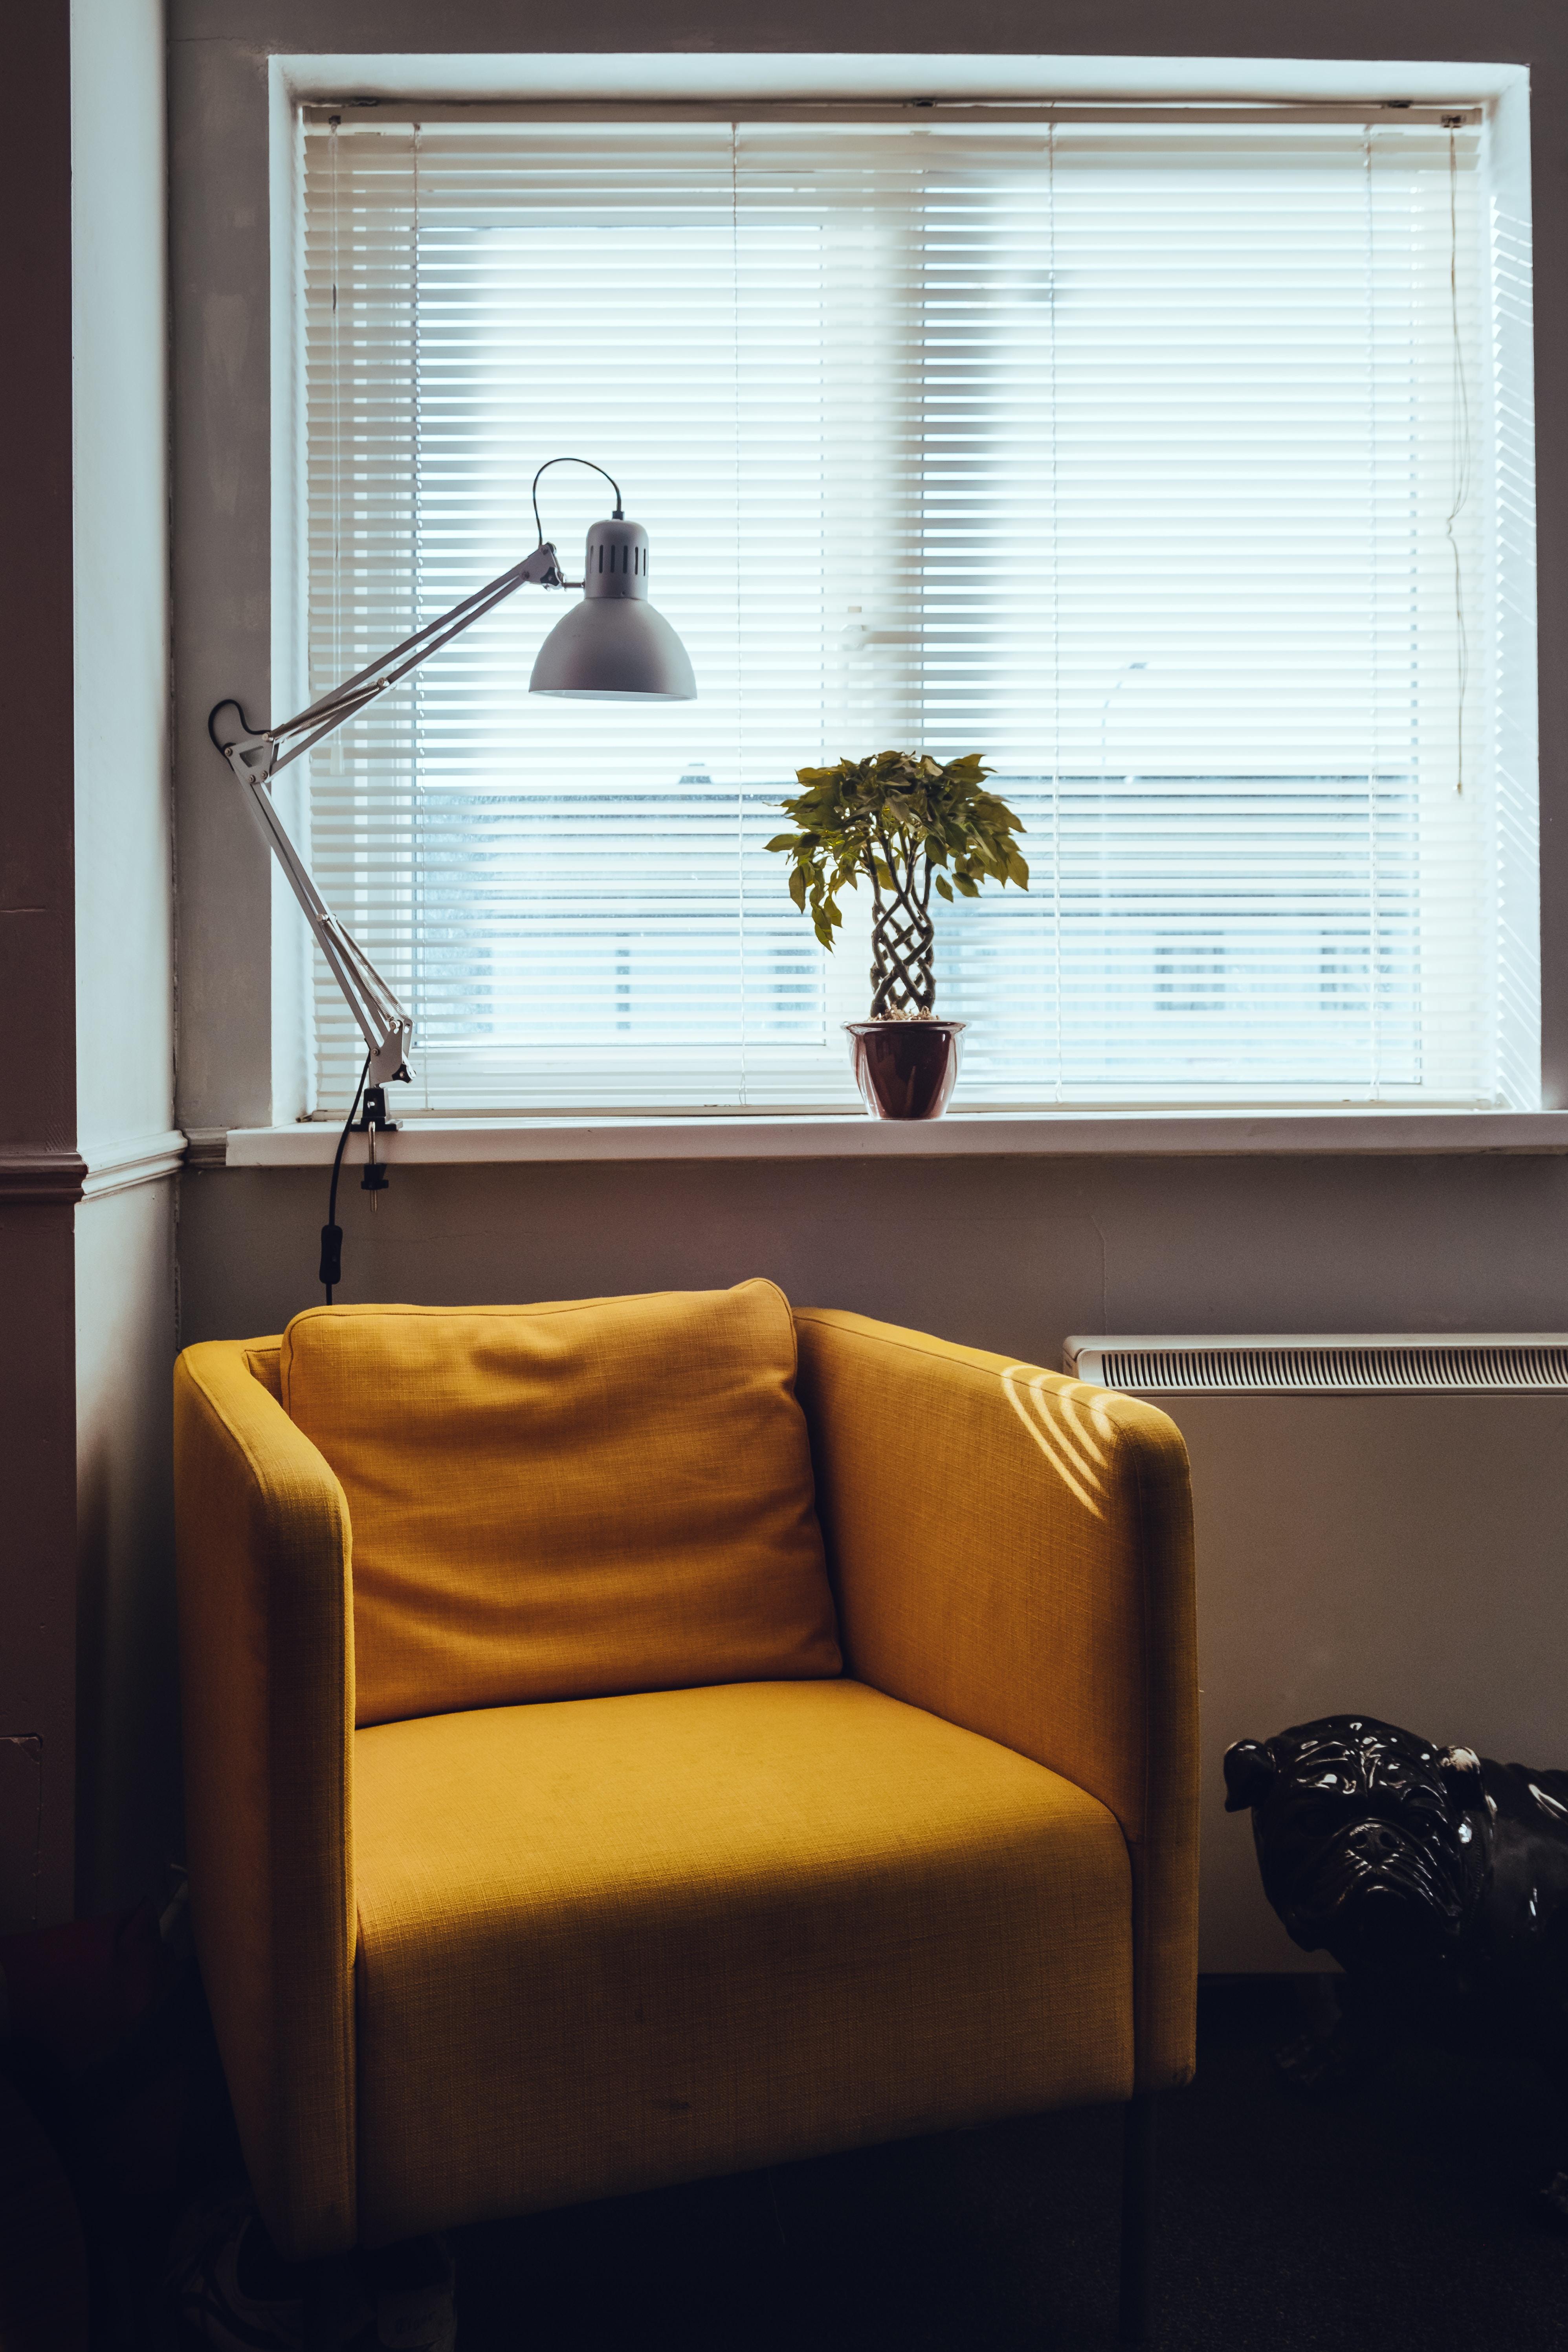 standing lamp near window